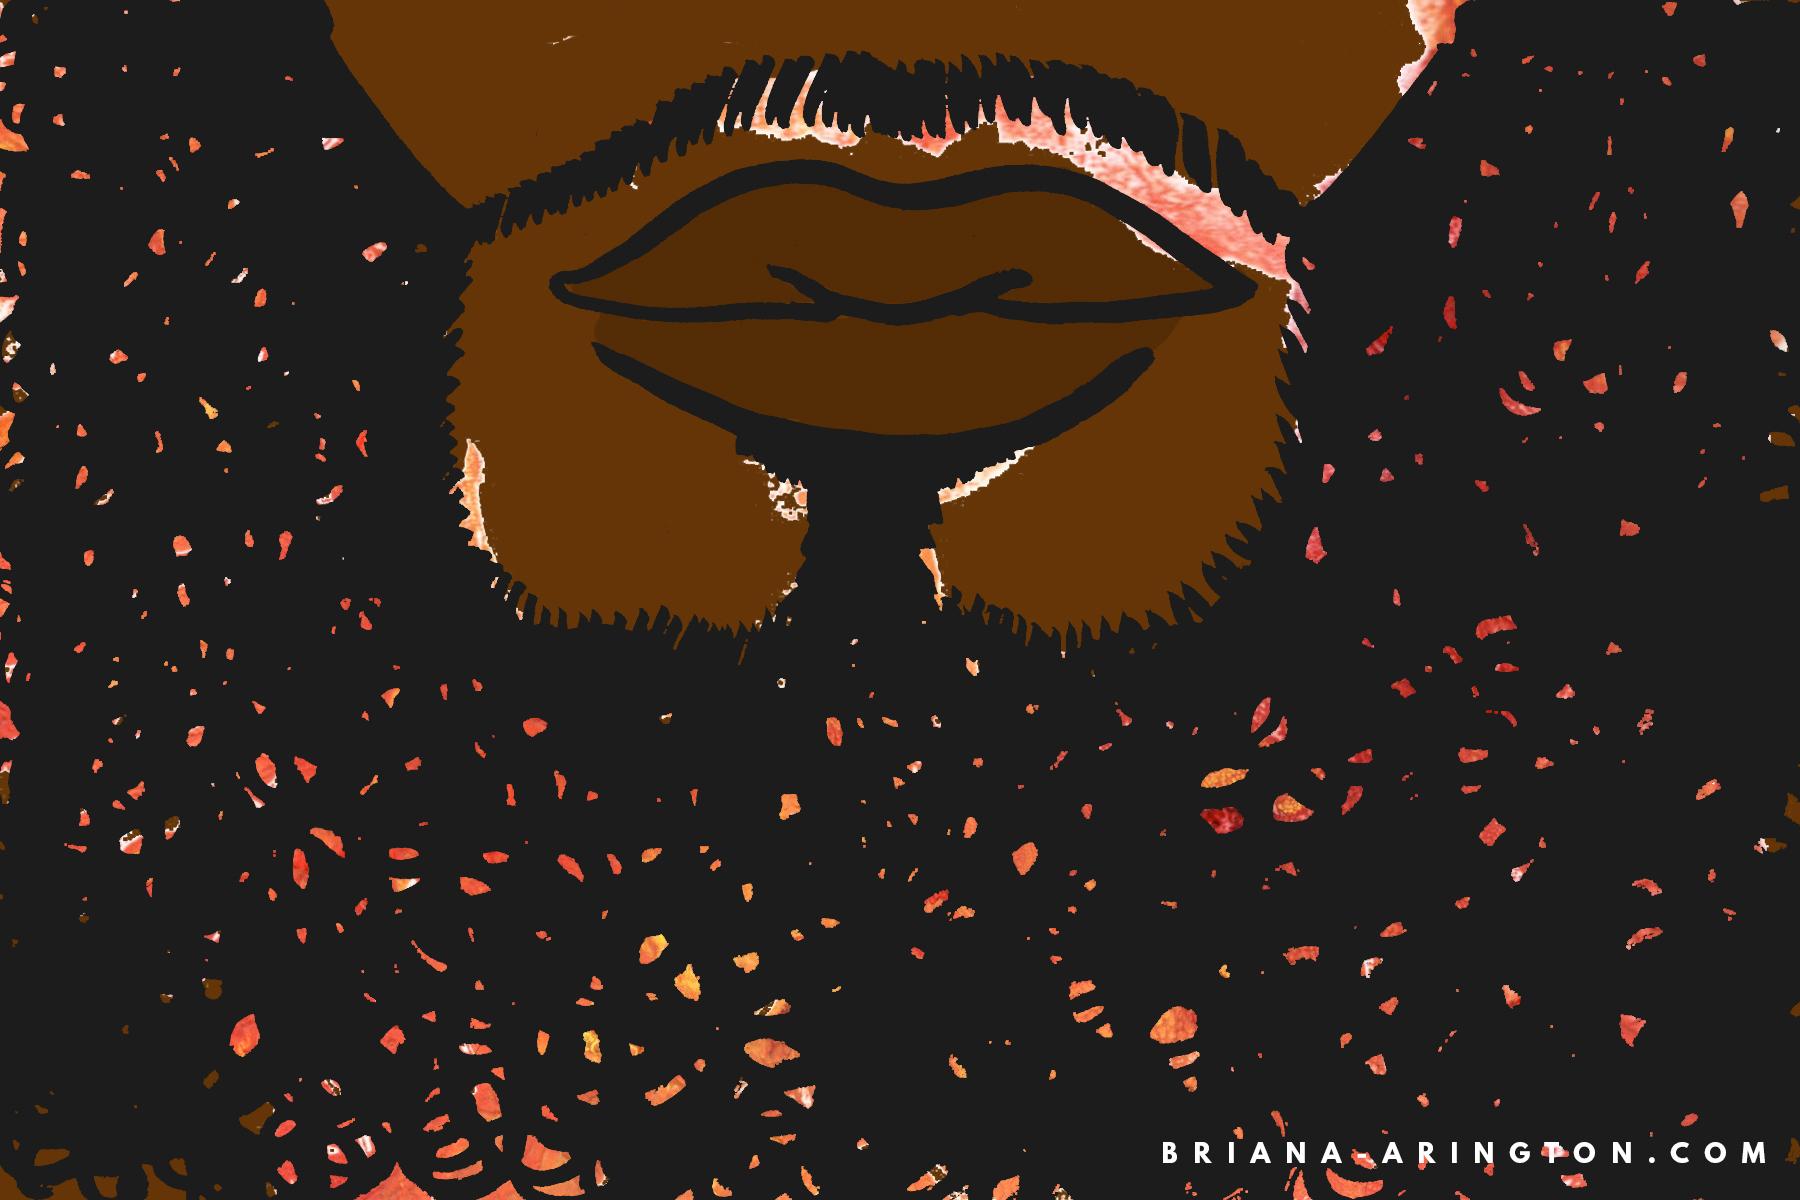 Beard (2018)